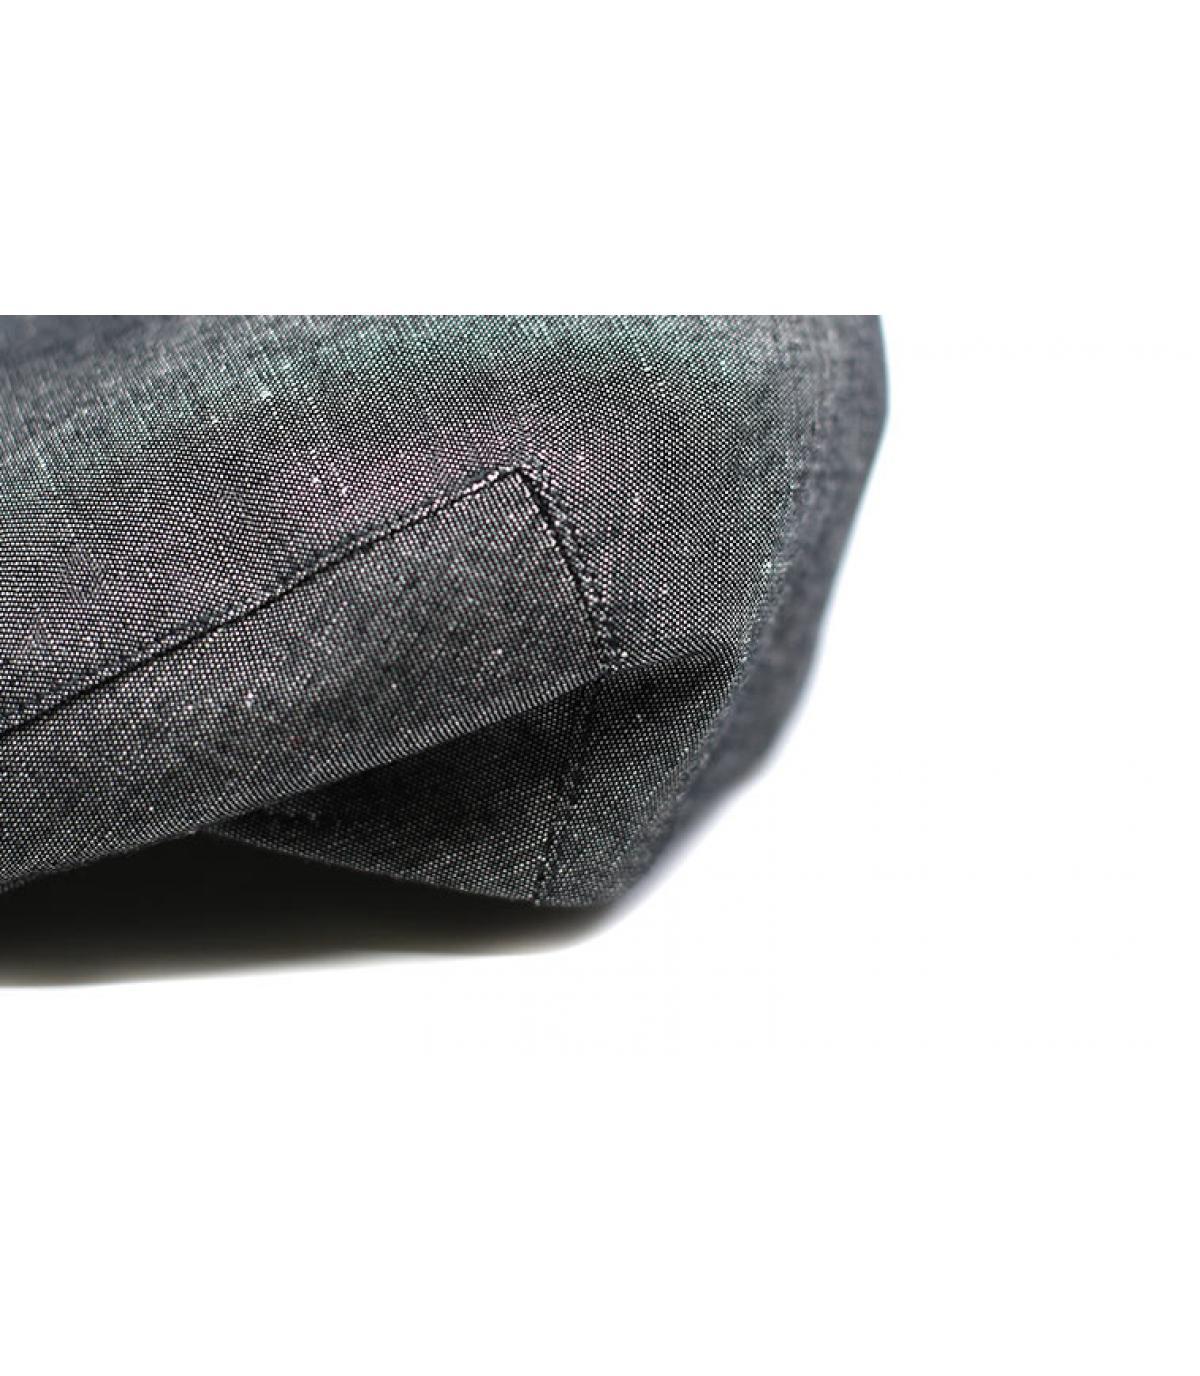 Détails Piemonte Balte anthracite - image 3